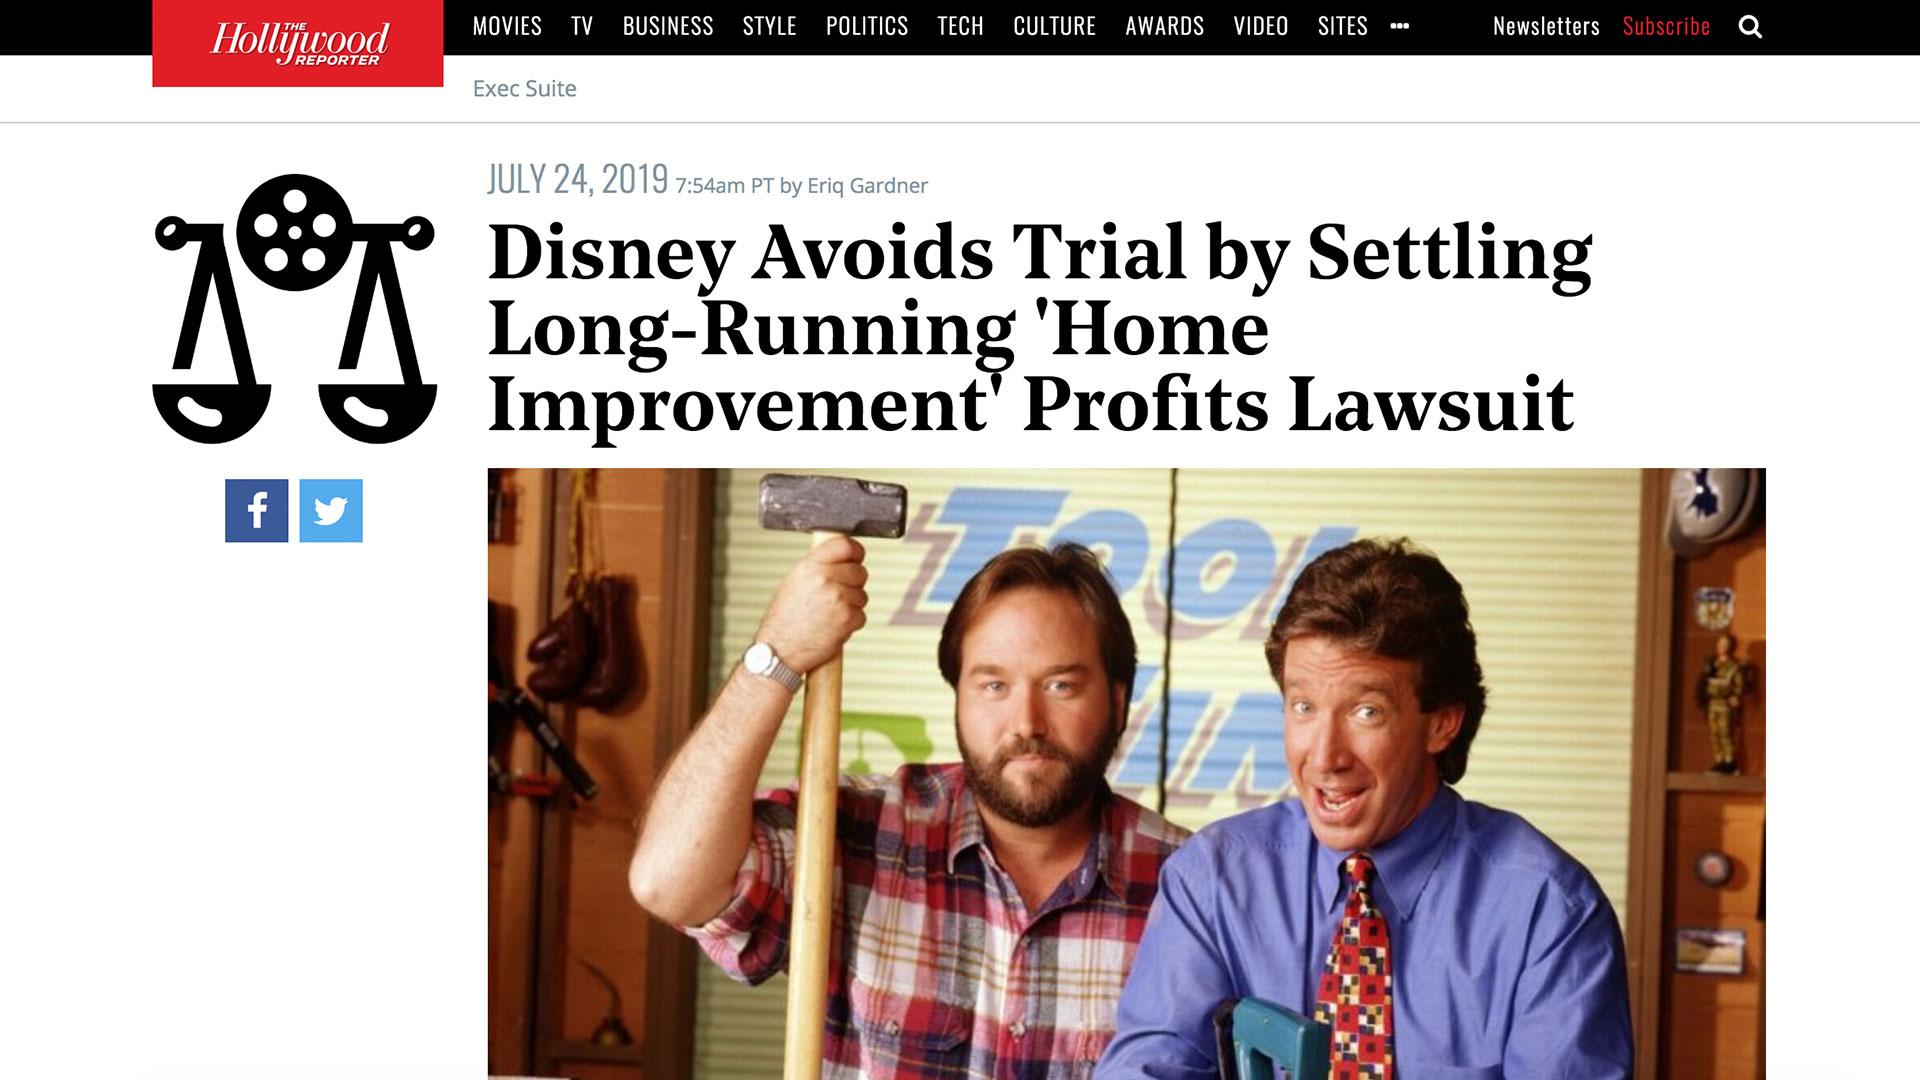 Fairness Rocks News Disney Avoids Trial by Settling Long-Running 'Home Improvement' Profits Lawsuit